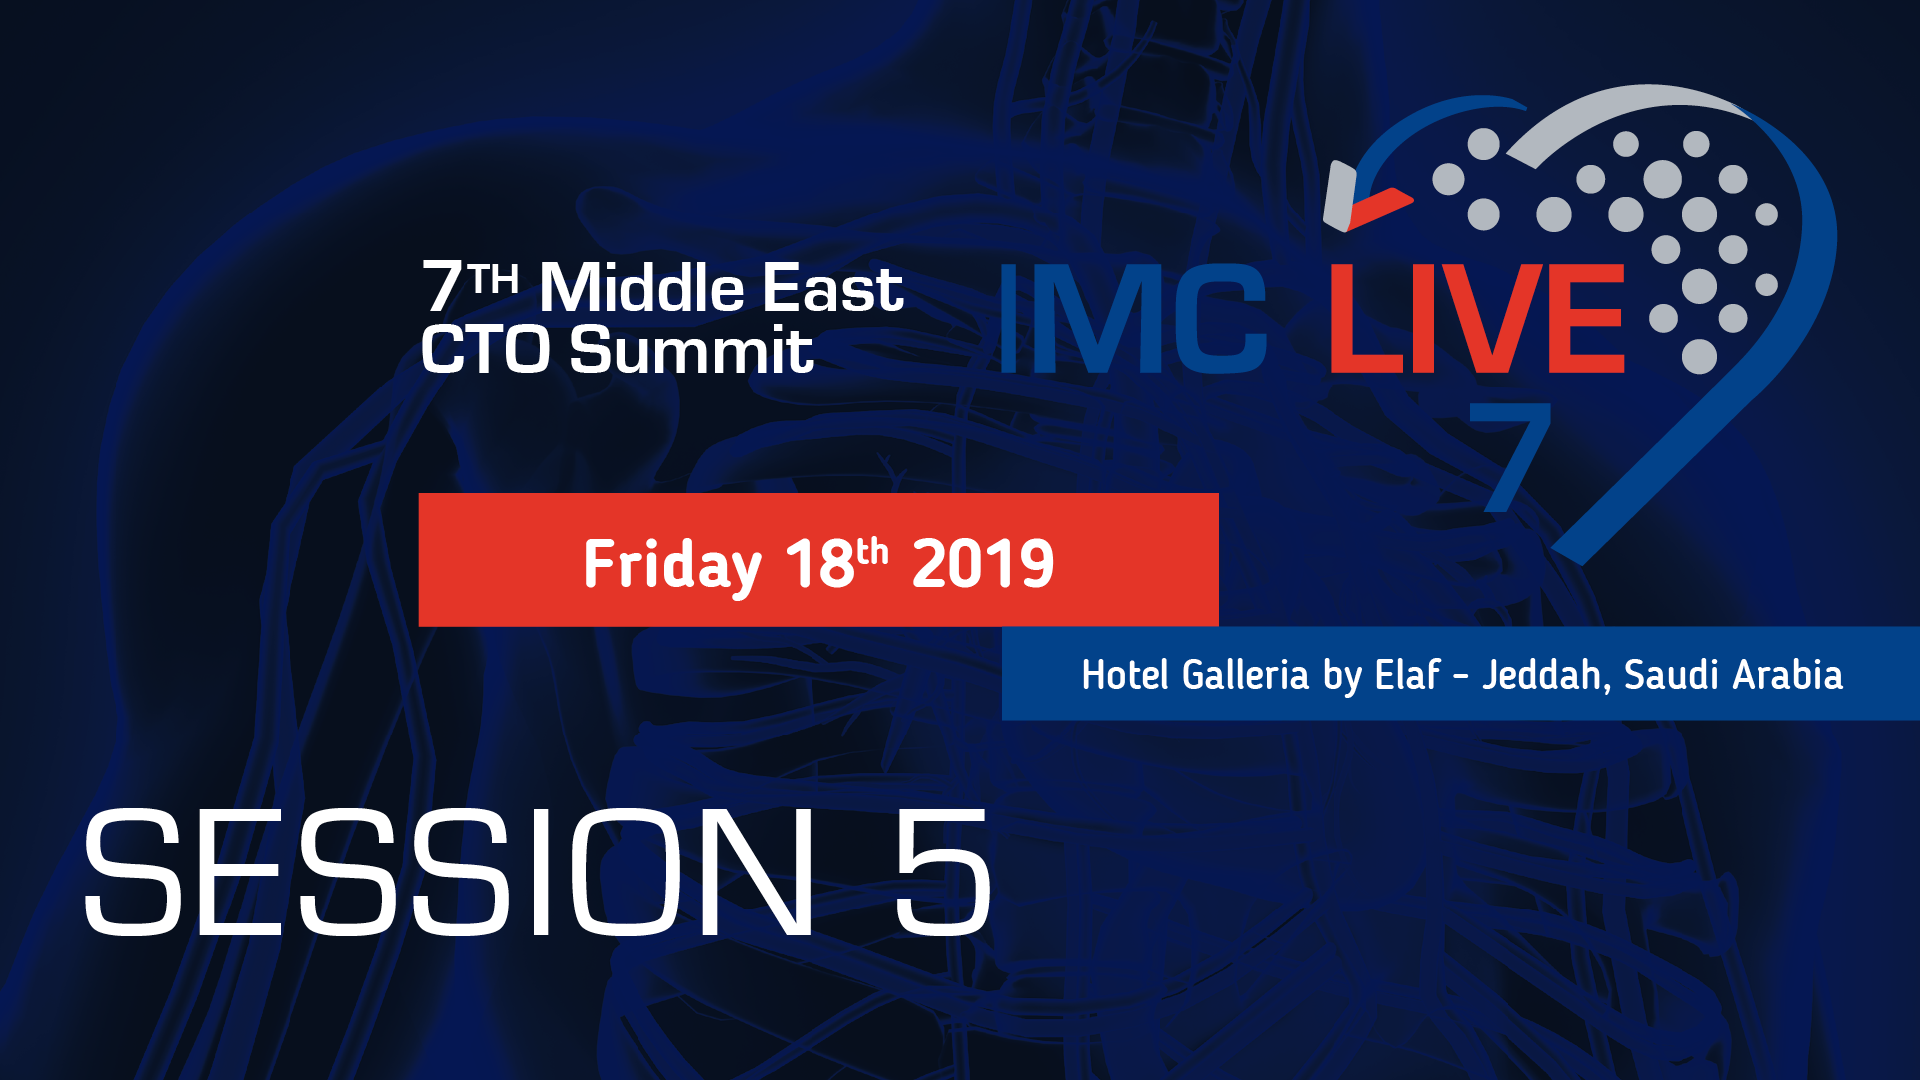 IMC LIVE 2019: SESSION 5